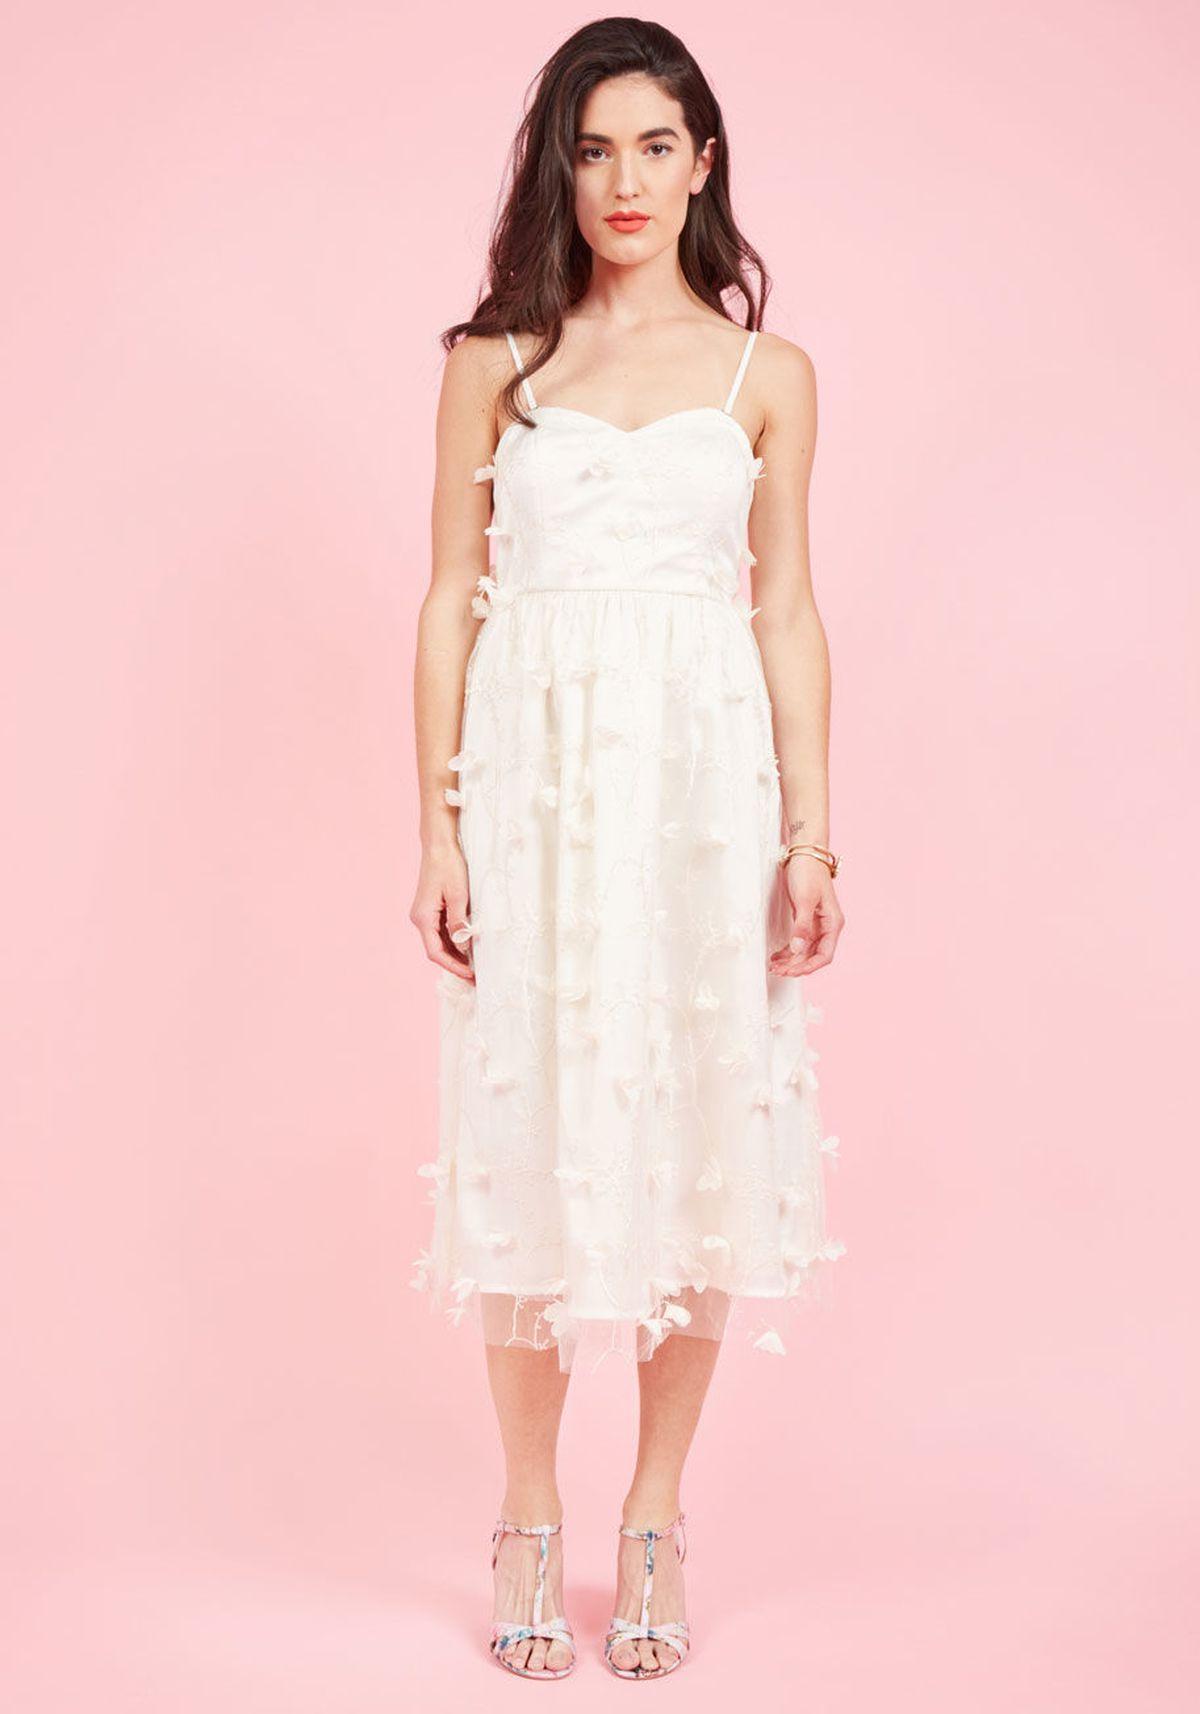 Model In Wedding Dress On Pink Background